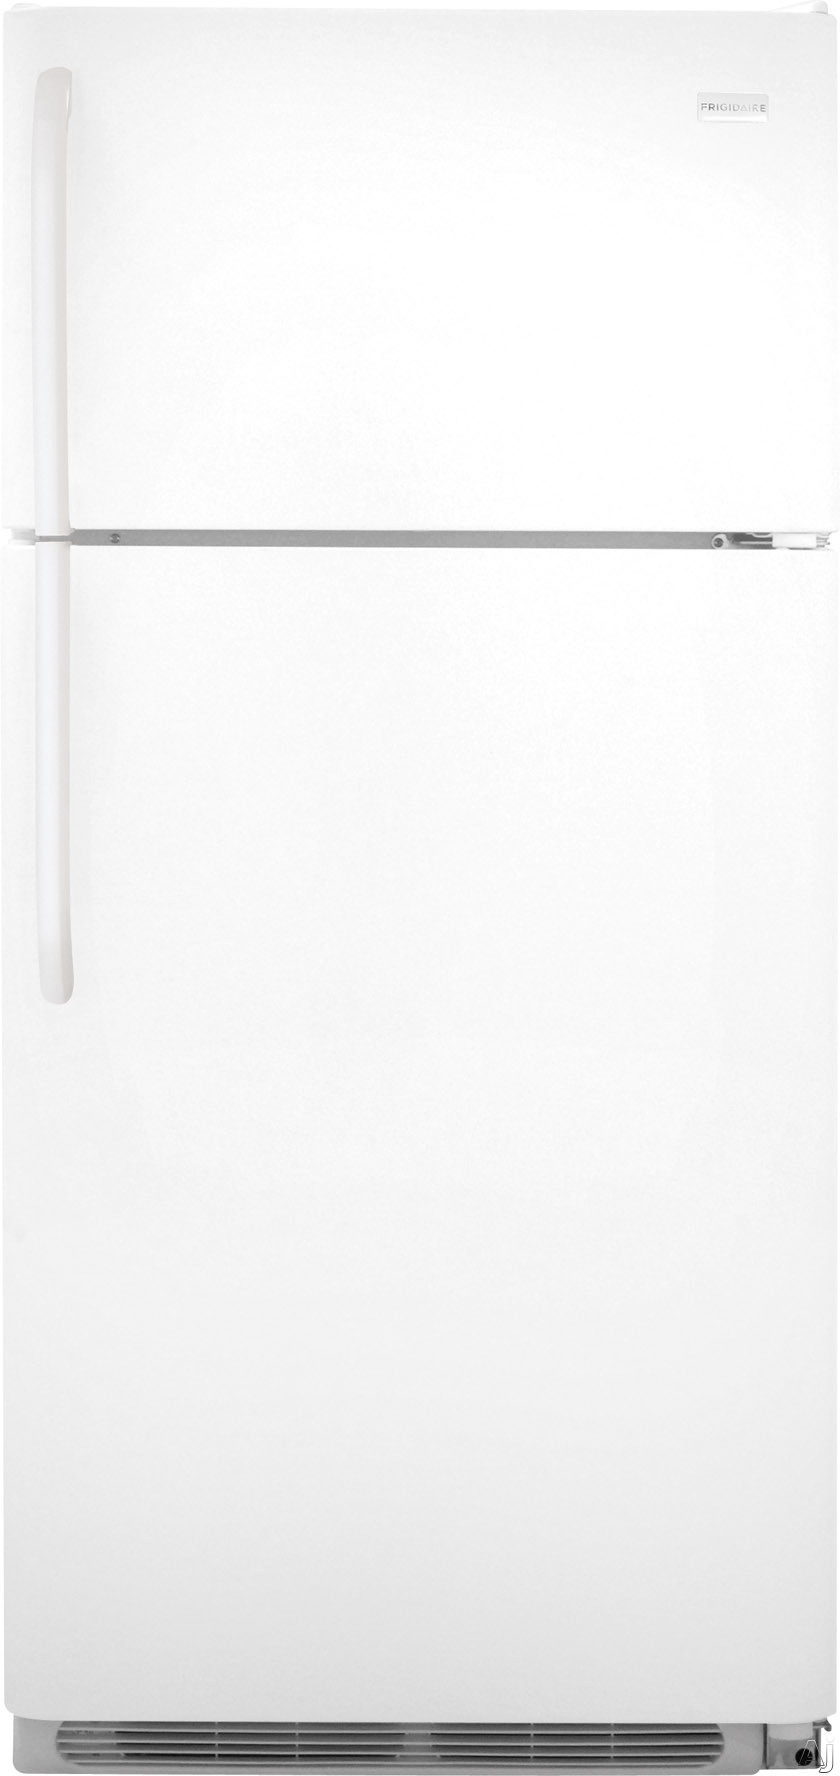 Frigidaire FFHI1831QP 30 Inch Top-Freezer Refrigerator with 18.0 cu. ft. Capacity, 2 SpillSafe Glass Shelves, Gallon Door Storage, 2 Crisper Drawers, 1 Deli Drawer, 3 Door Racks, Covered Dairy Bin, ADA Compliant, ENERGY STAR Qualified and Ice Maker: White